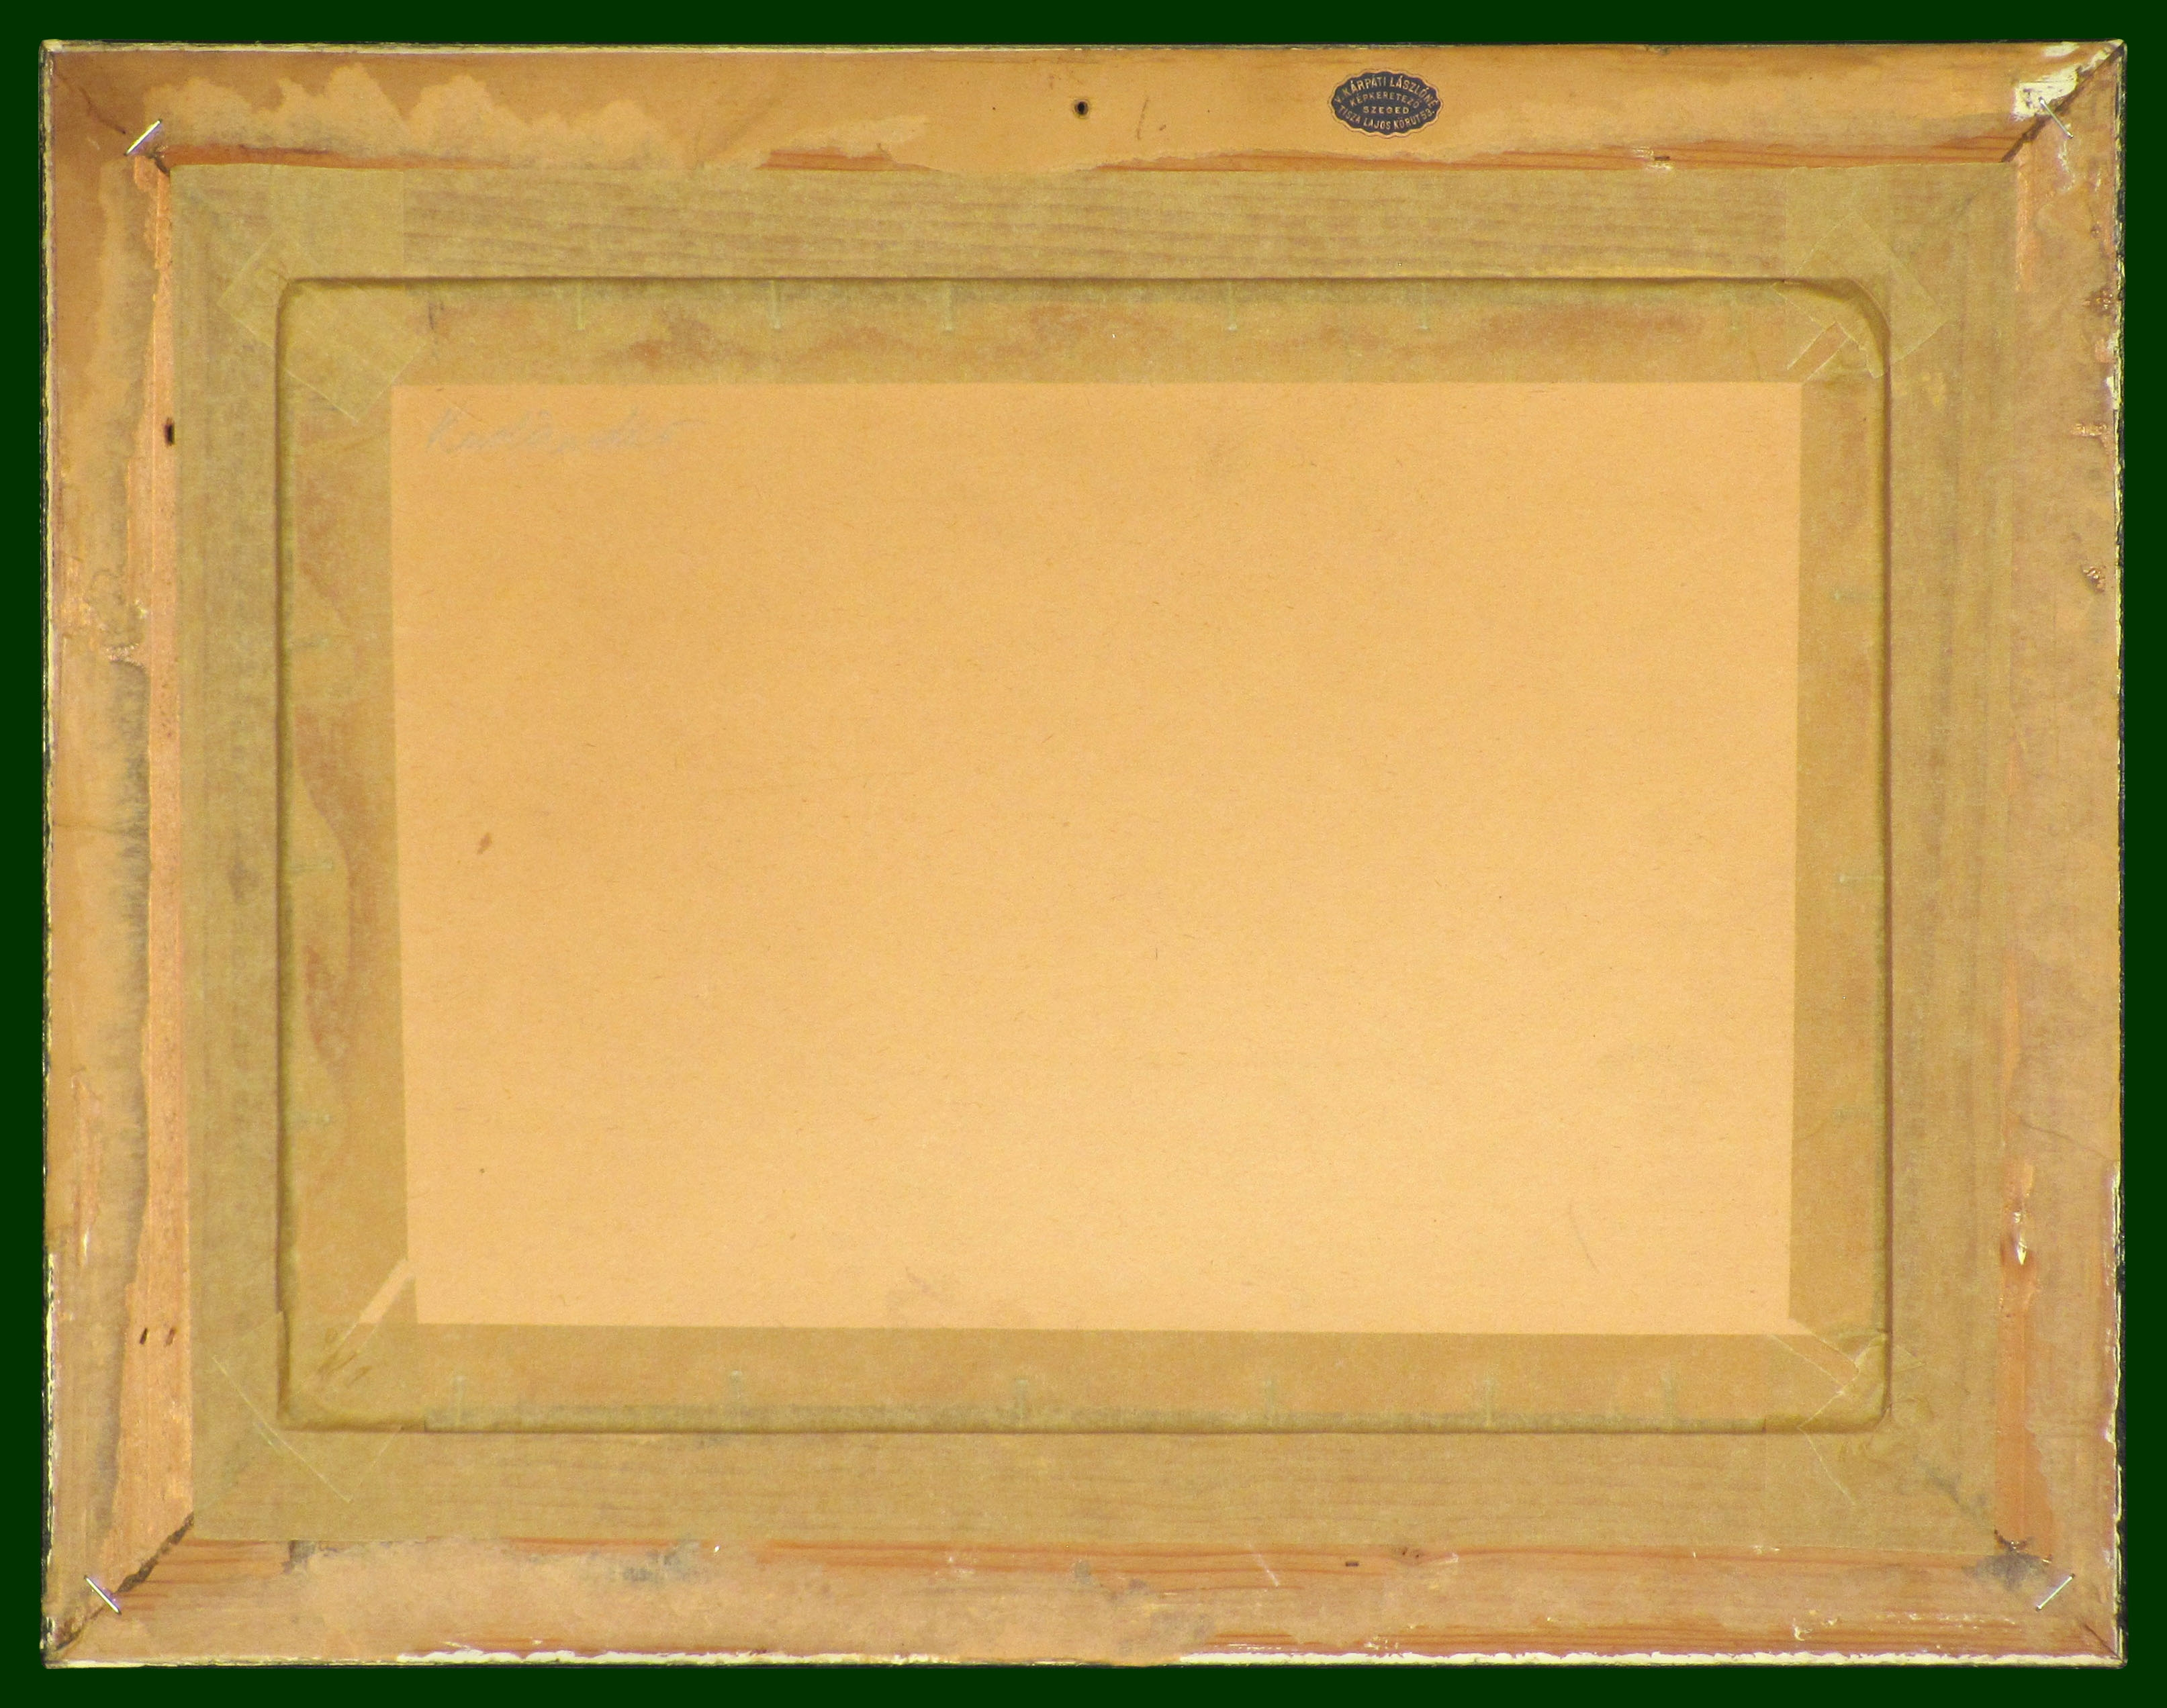 98-10hat.jpg (3227×2544)